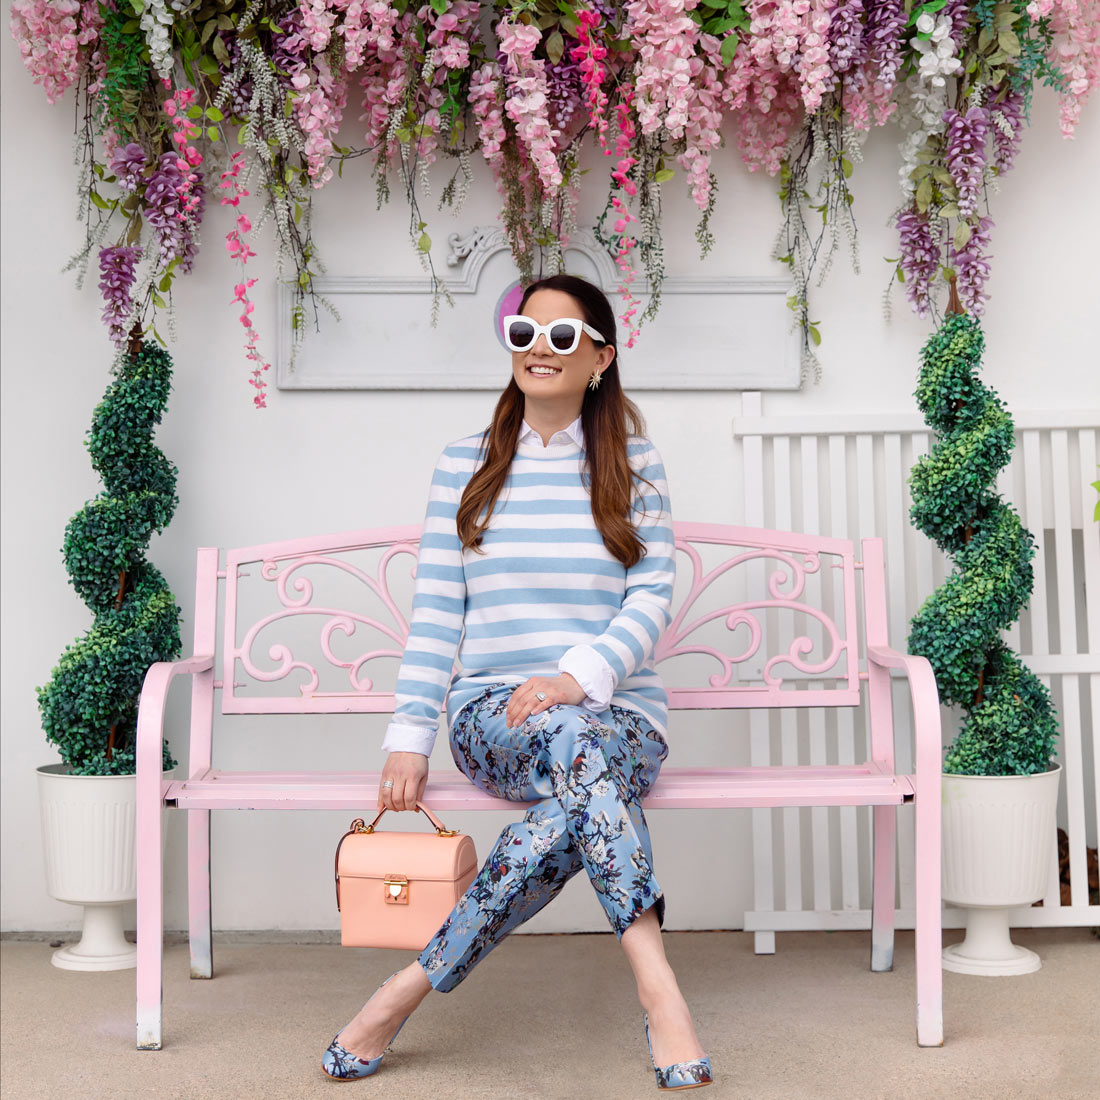 Jennifer Lake Pink Bench Floral Wall